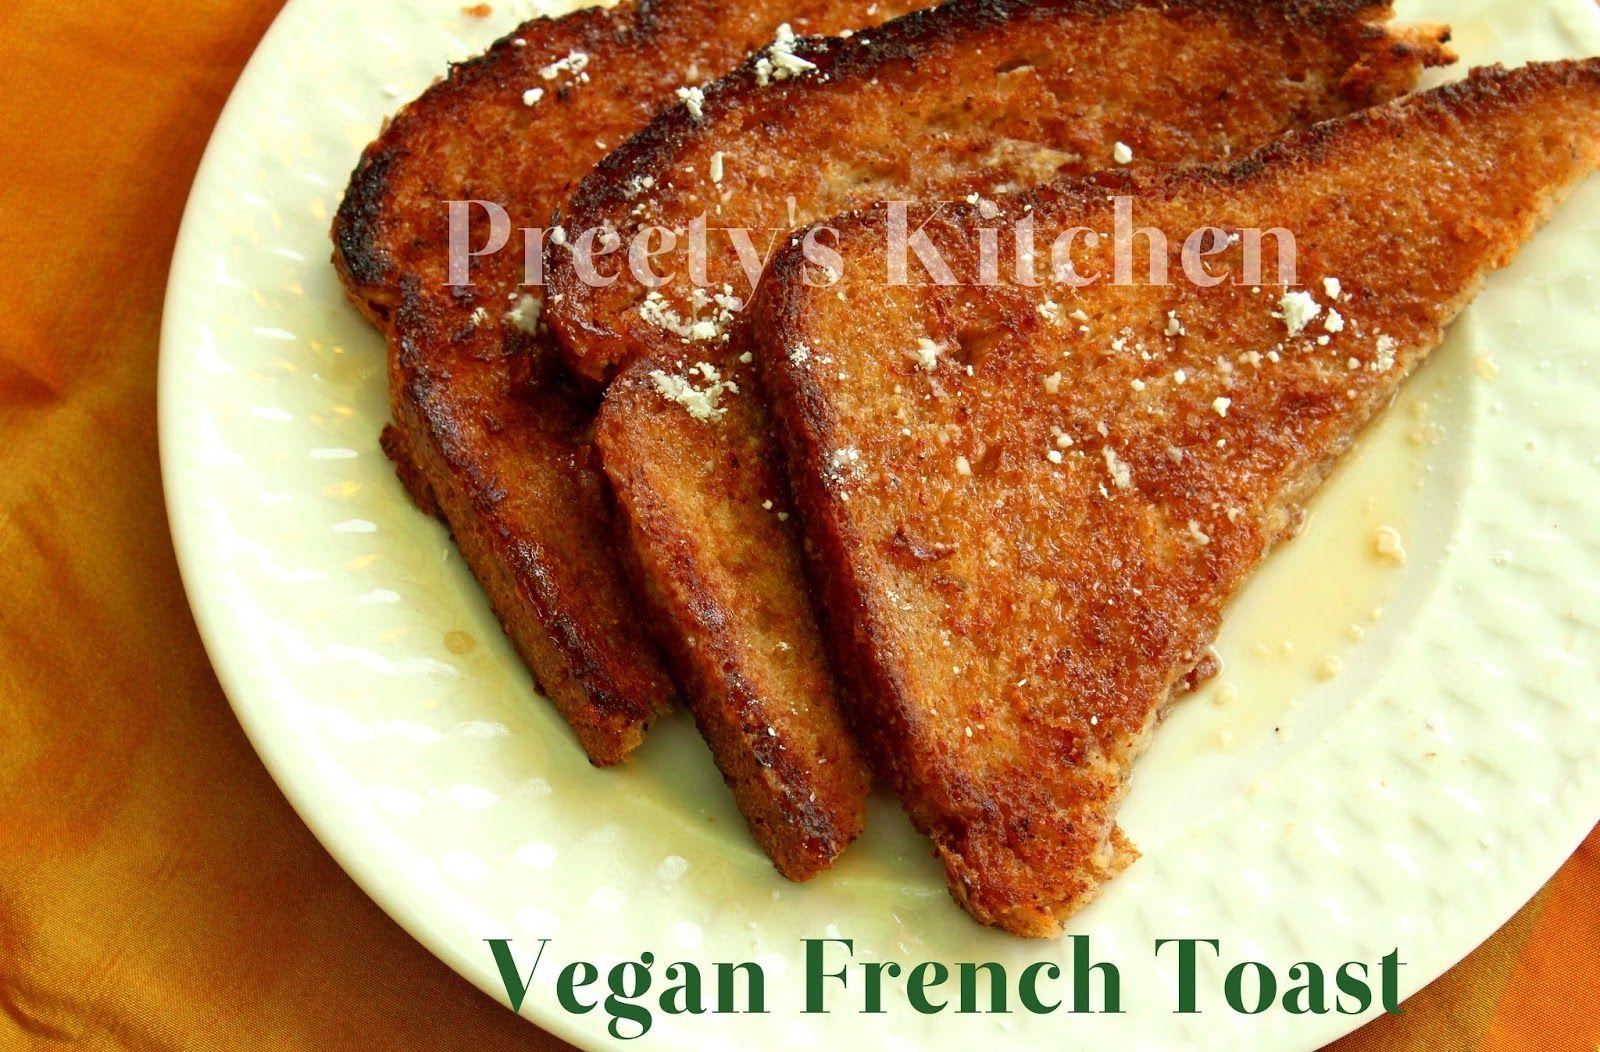 Preety's Kitchen: Vegan French Toast / Eggless French Toast